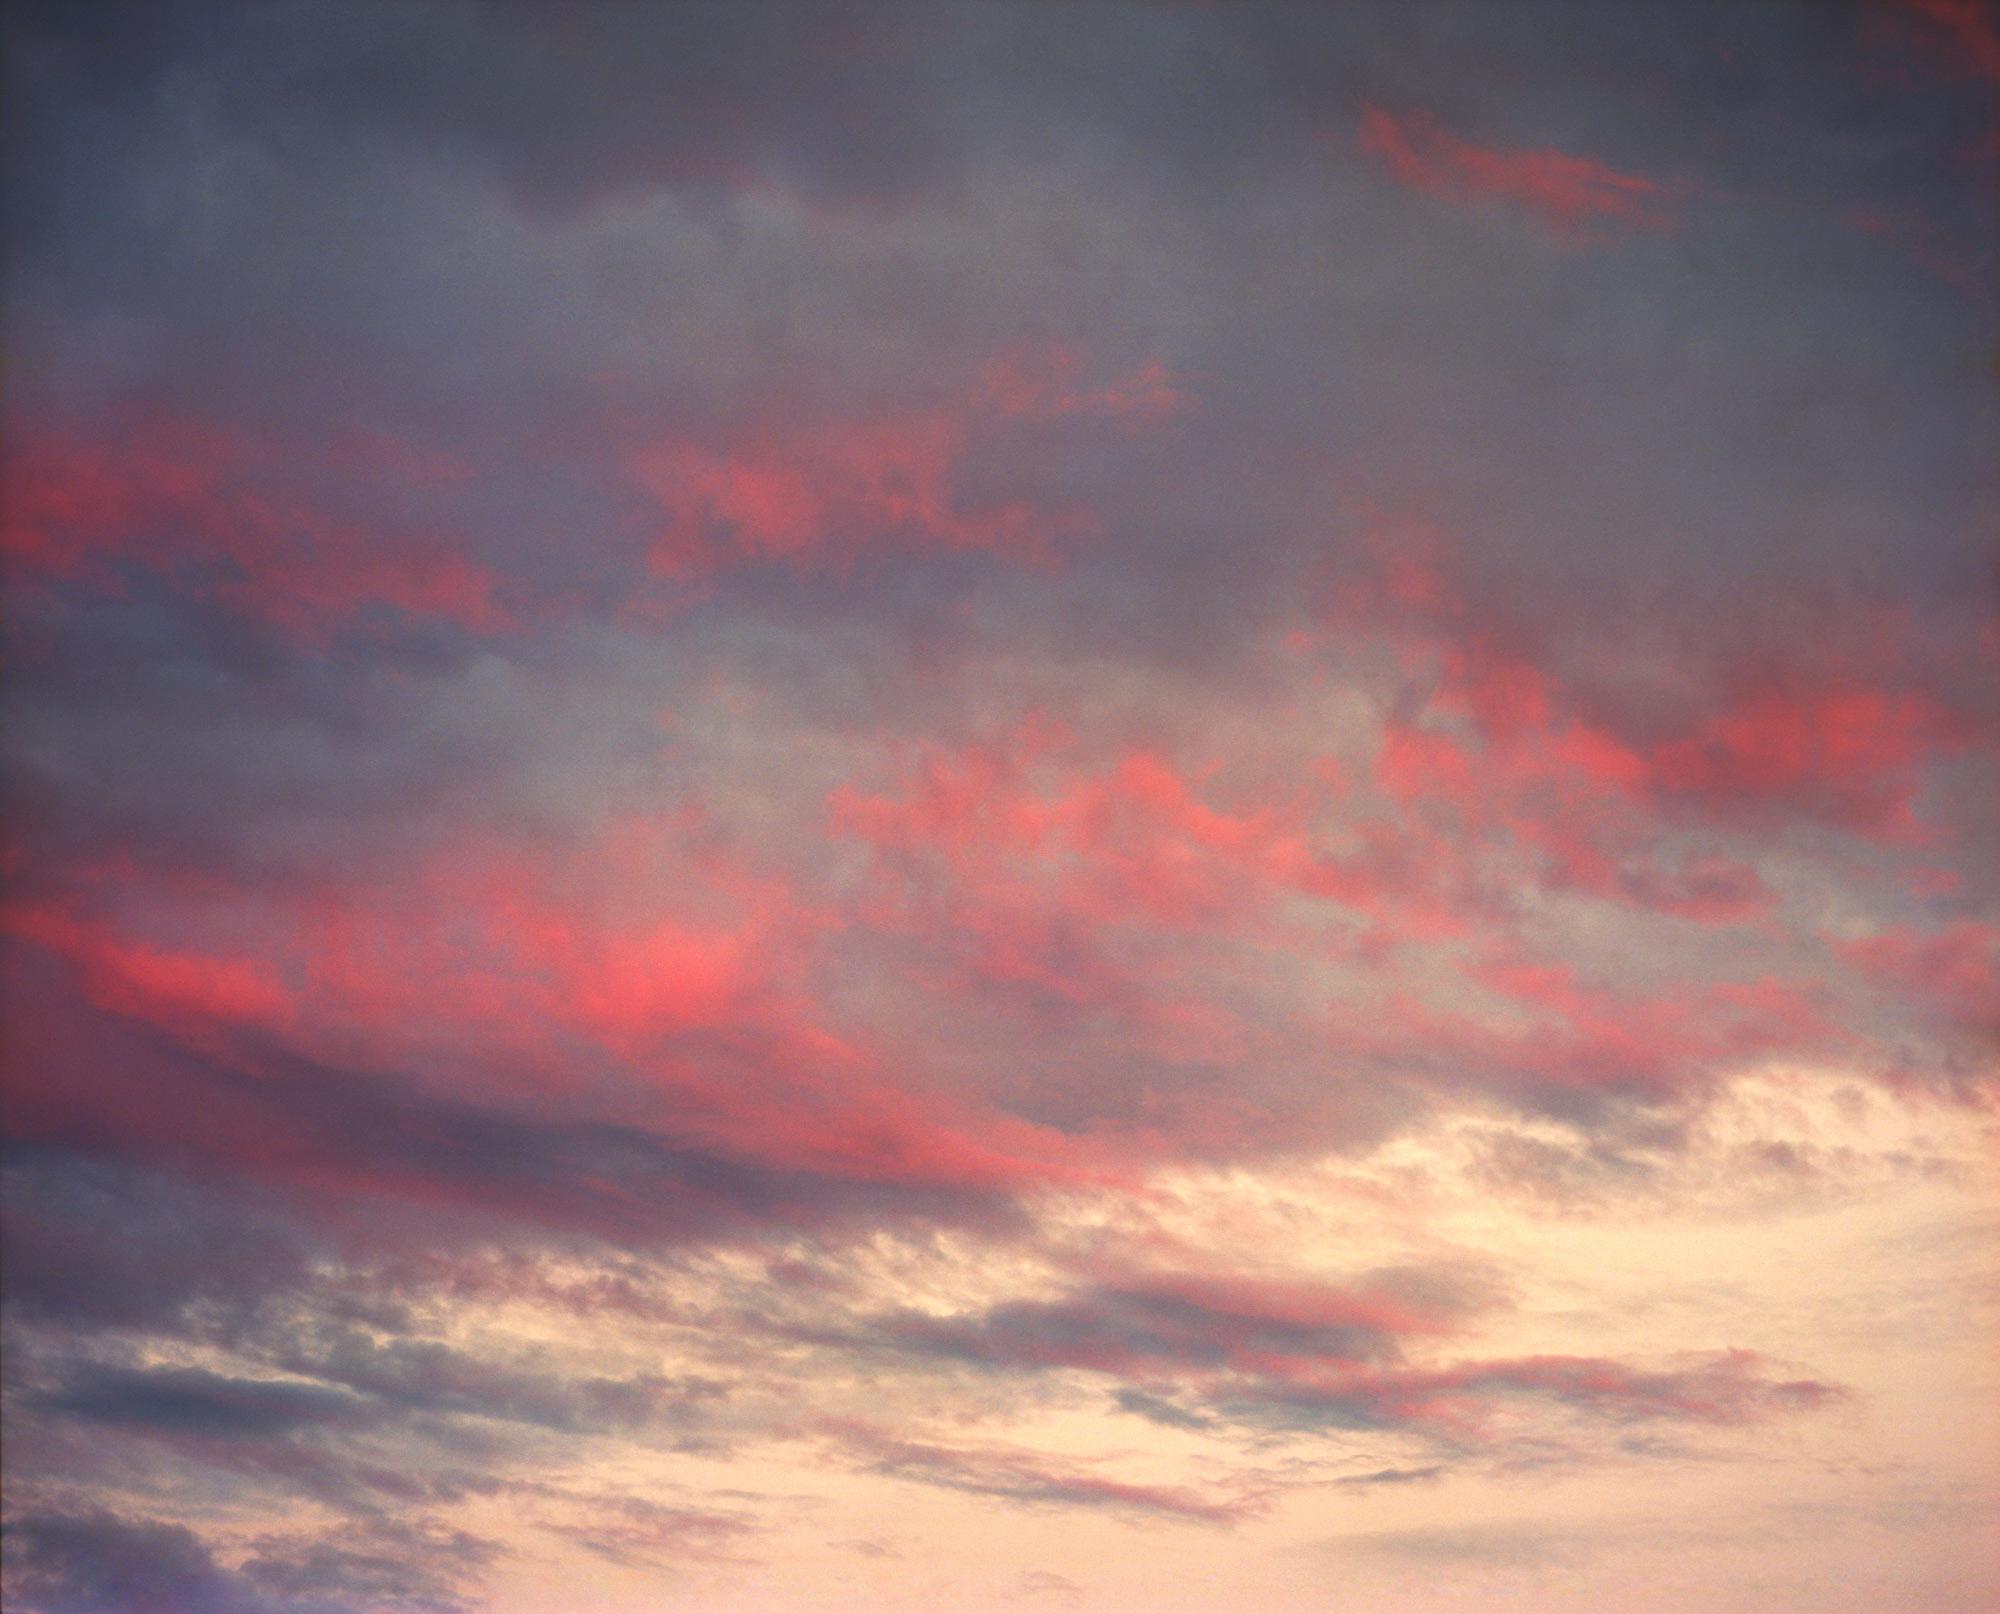 Burning Sunset, red skies observation on film by ioannis koussertari.i